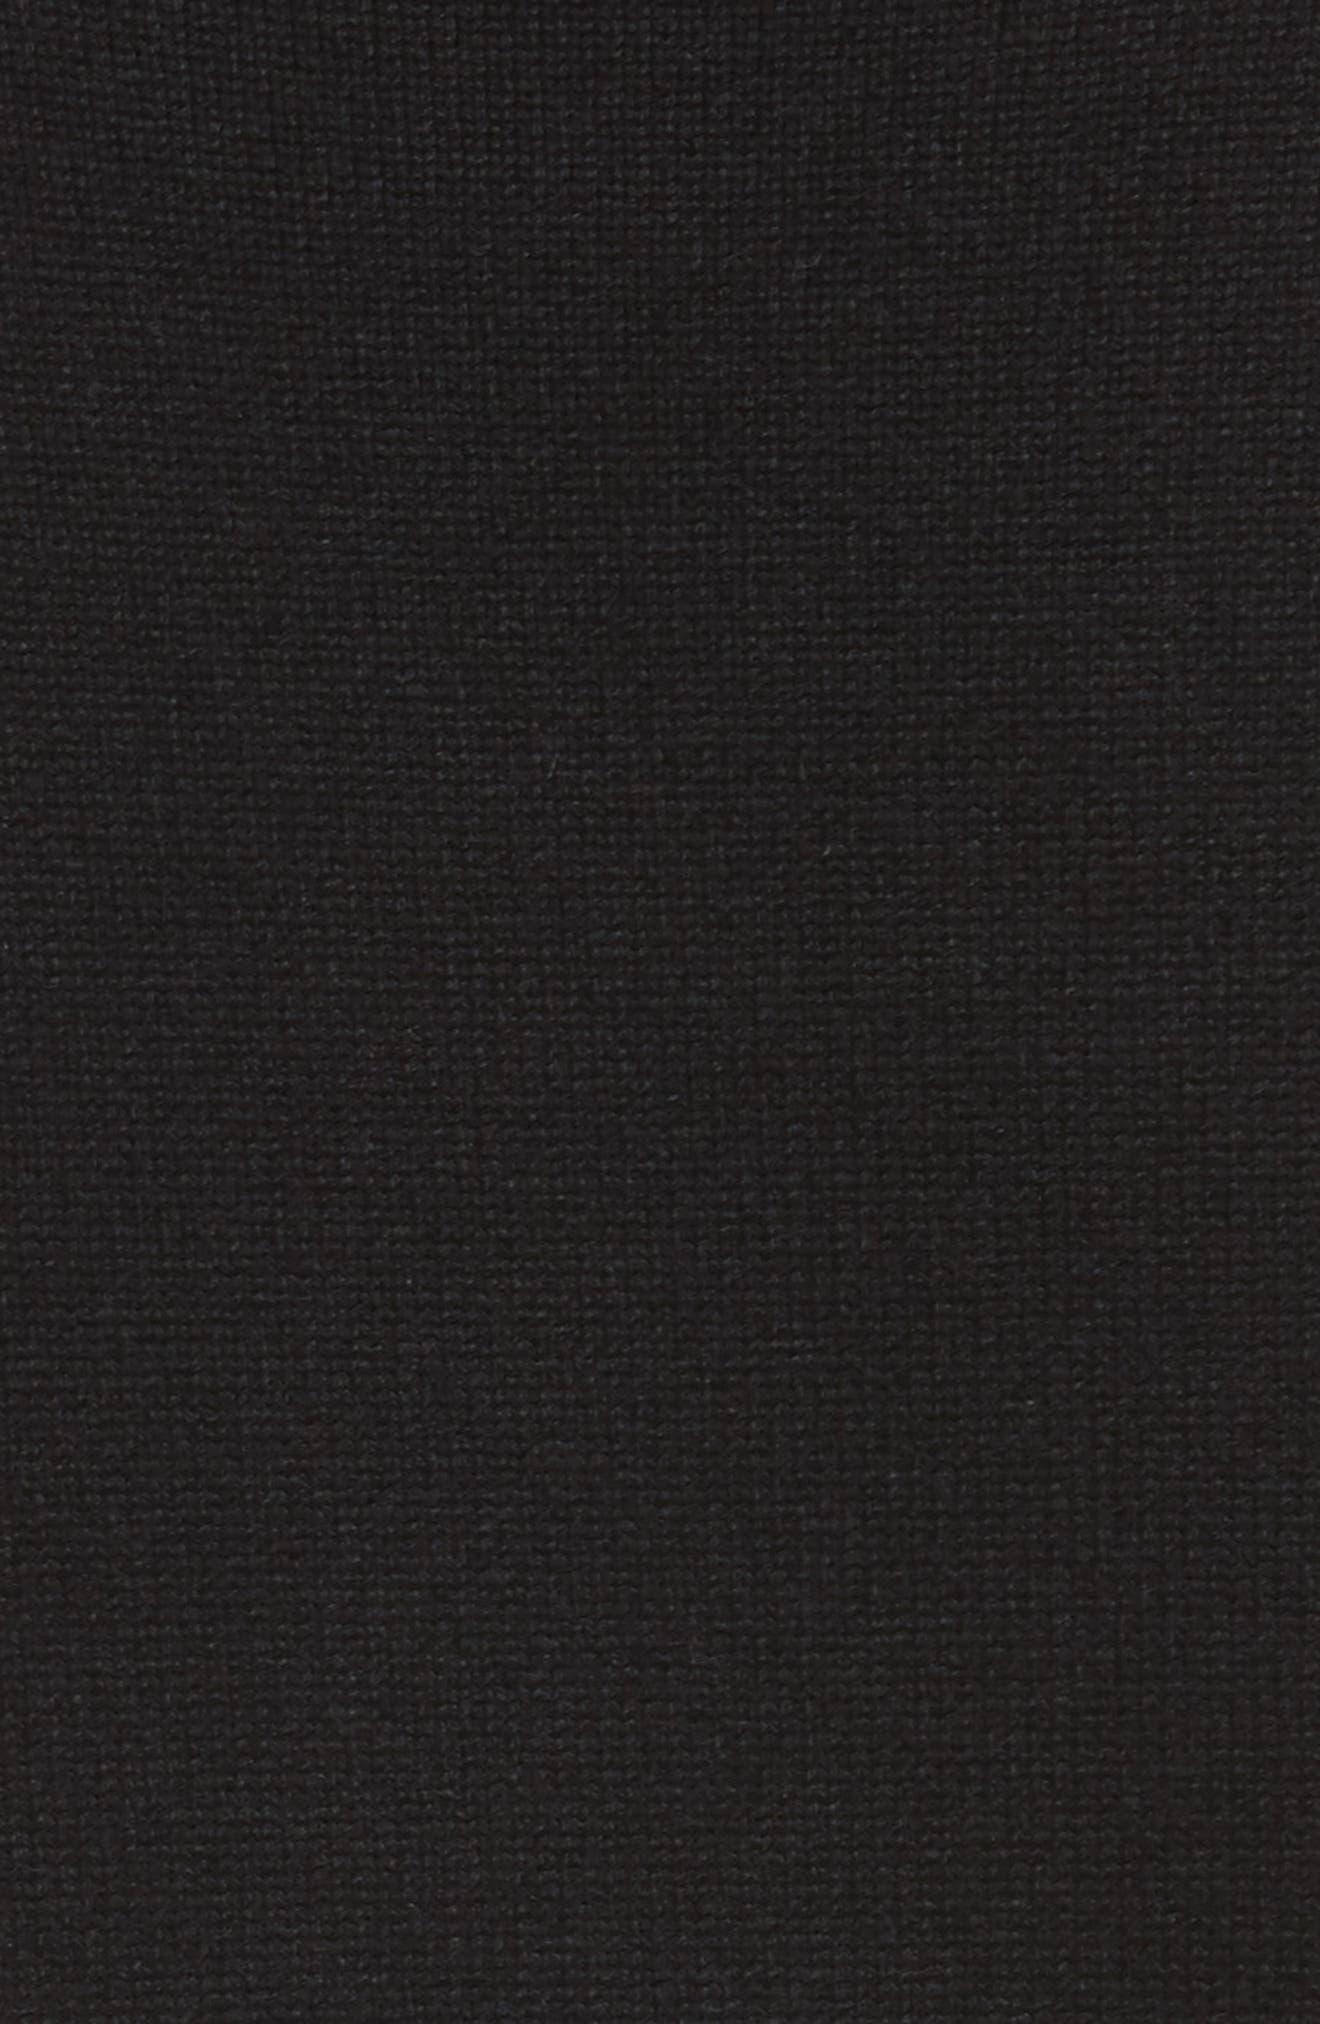 Cashmere Blend Bell Sleeve Dress,                             Alternate thumbnail 6, color,                             Black